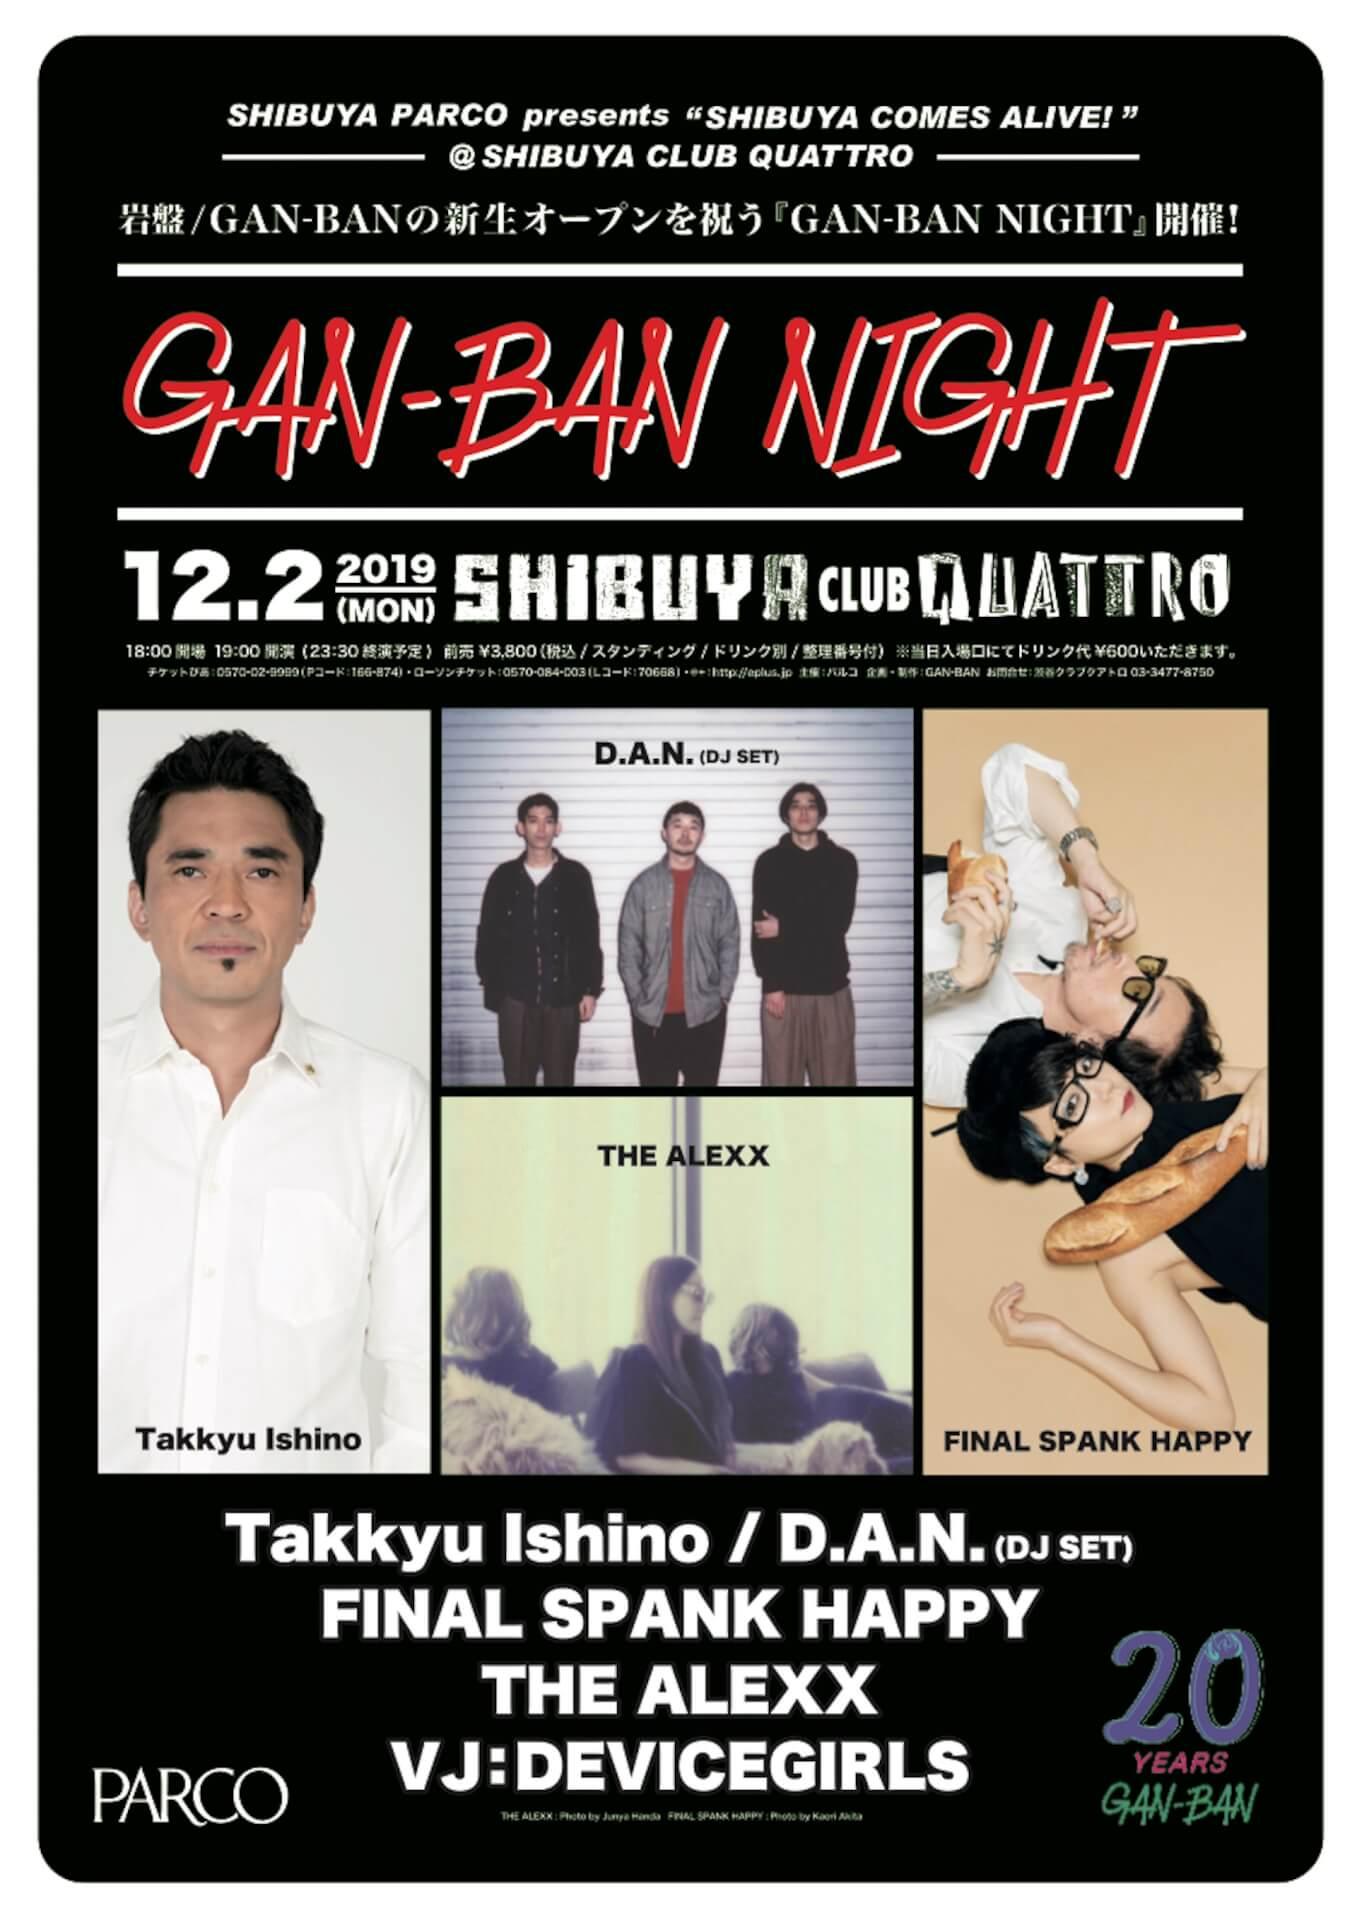 TAKKYU ISHINO、D.A.N.らが集う<GAN-BAN NIGHT>がいよいよ来週開催!デビューライブ以来2度目のパフォーマンスとなるTHE ALEXXからコメントも music191125_ganbannight_6-1